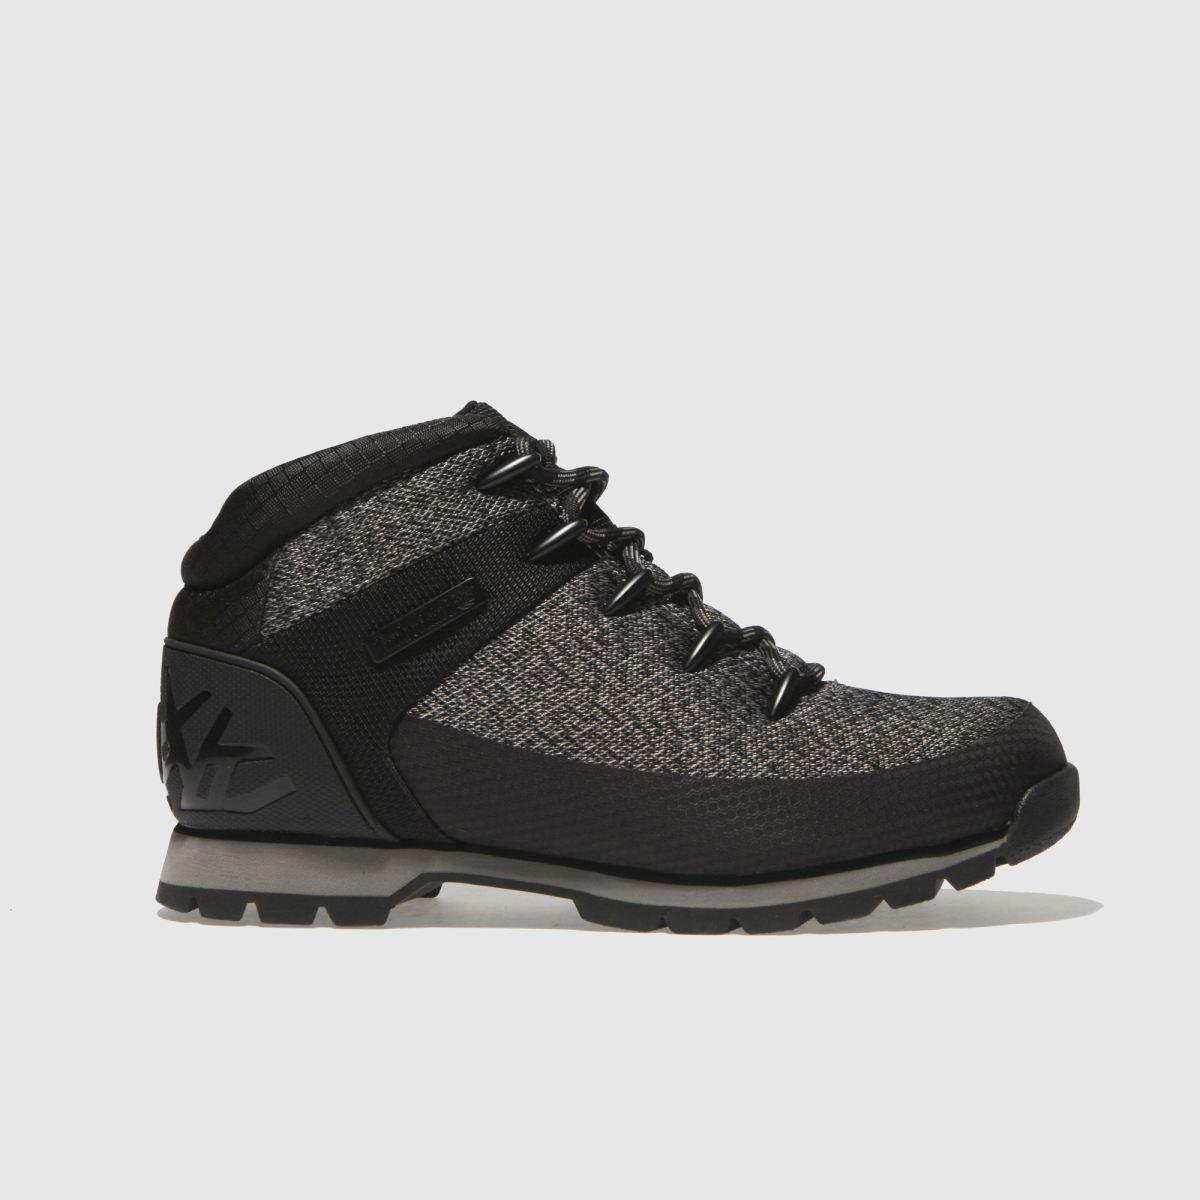 Timberland Black & Grey Euro Sprint Fabric Boots